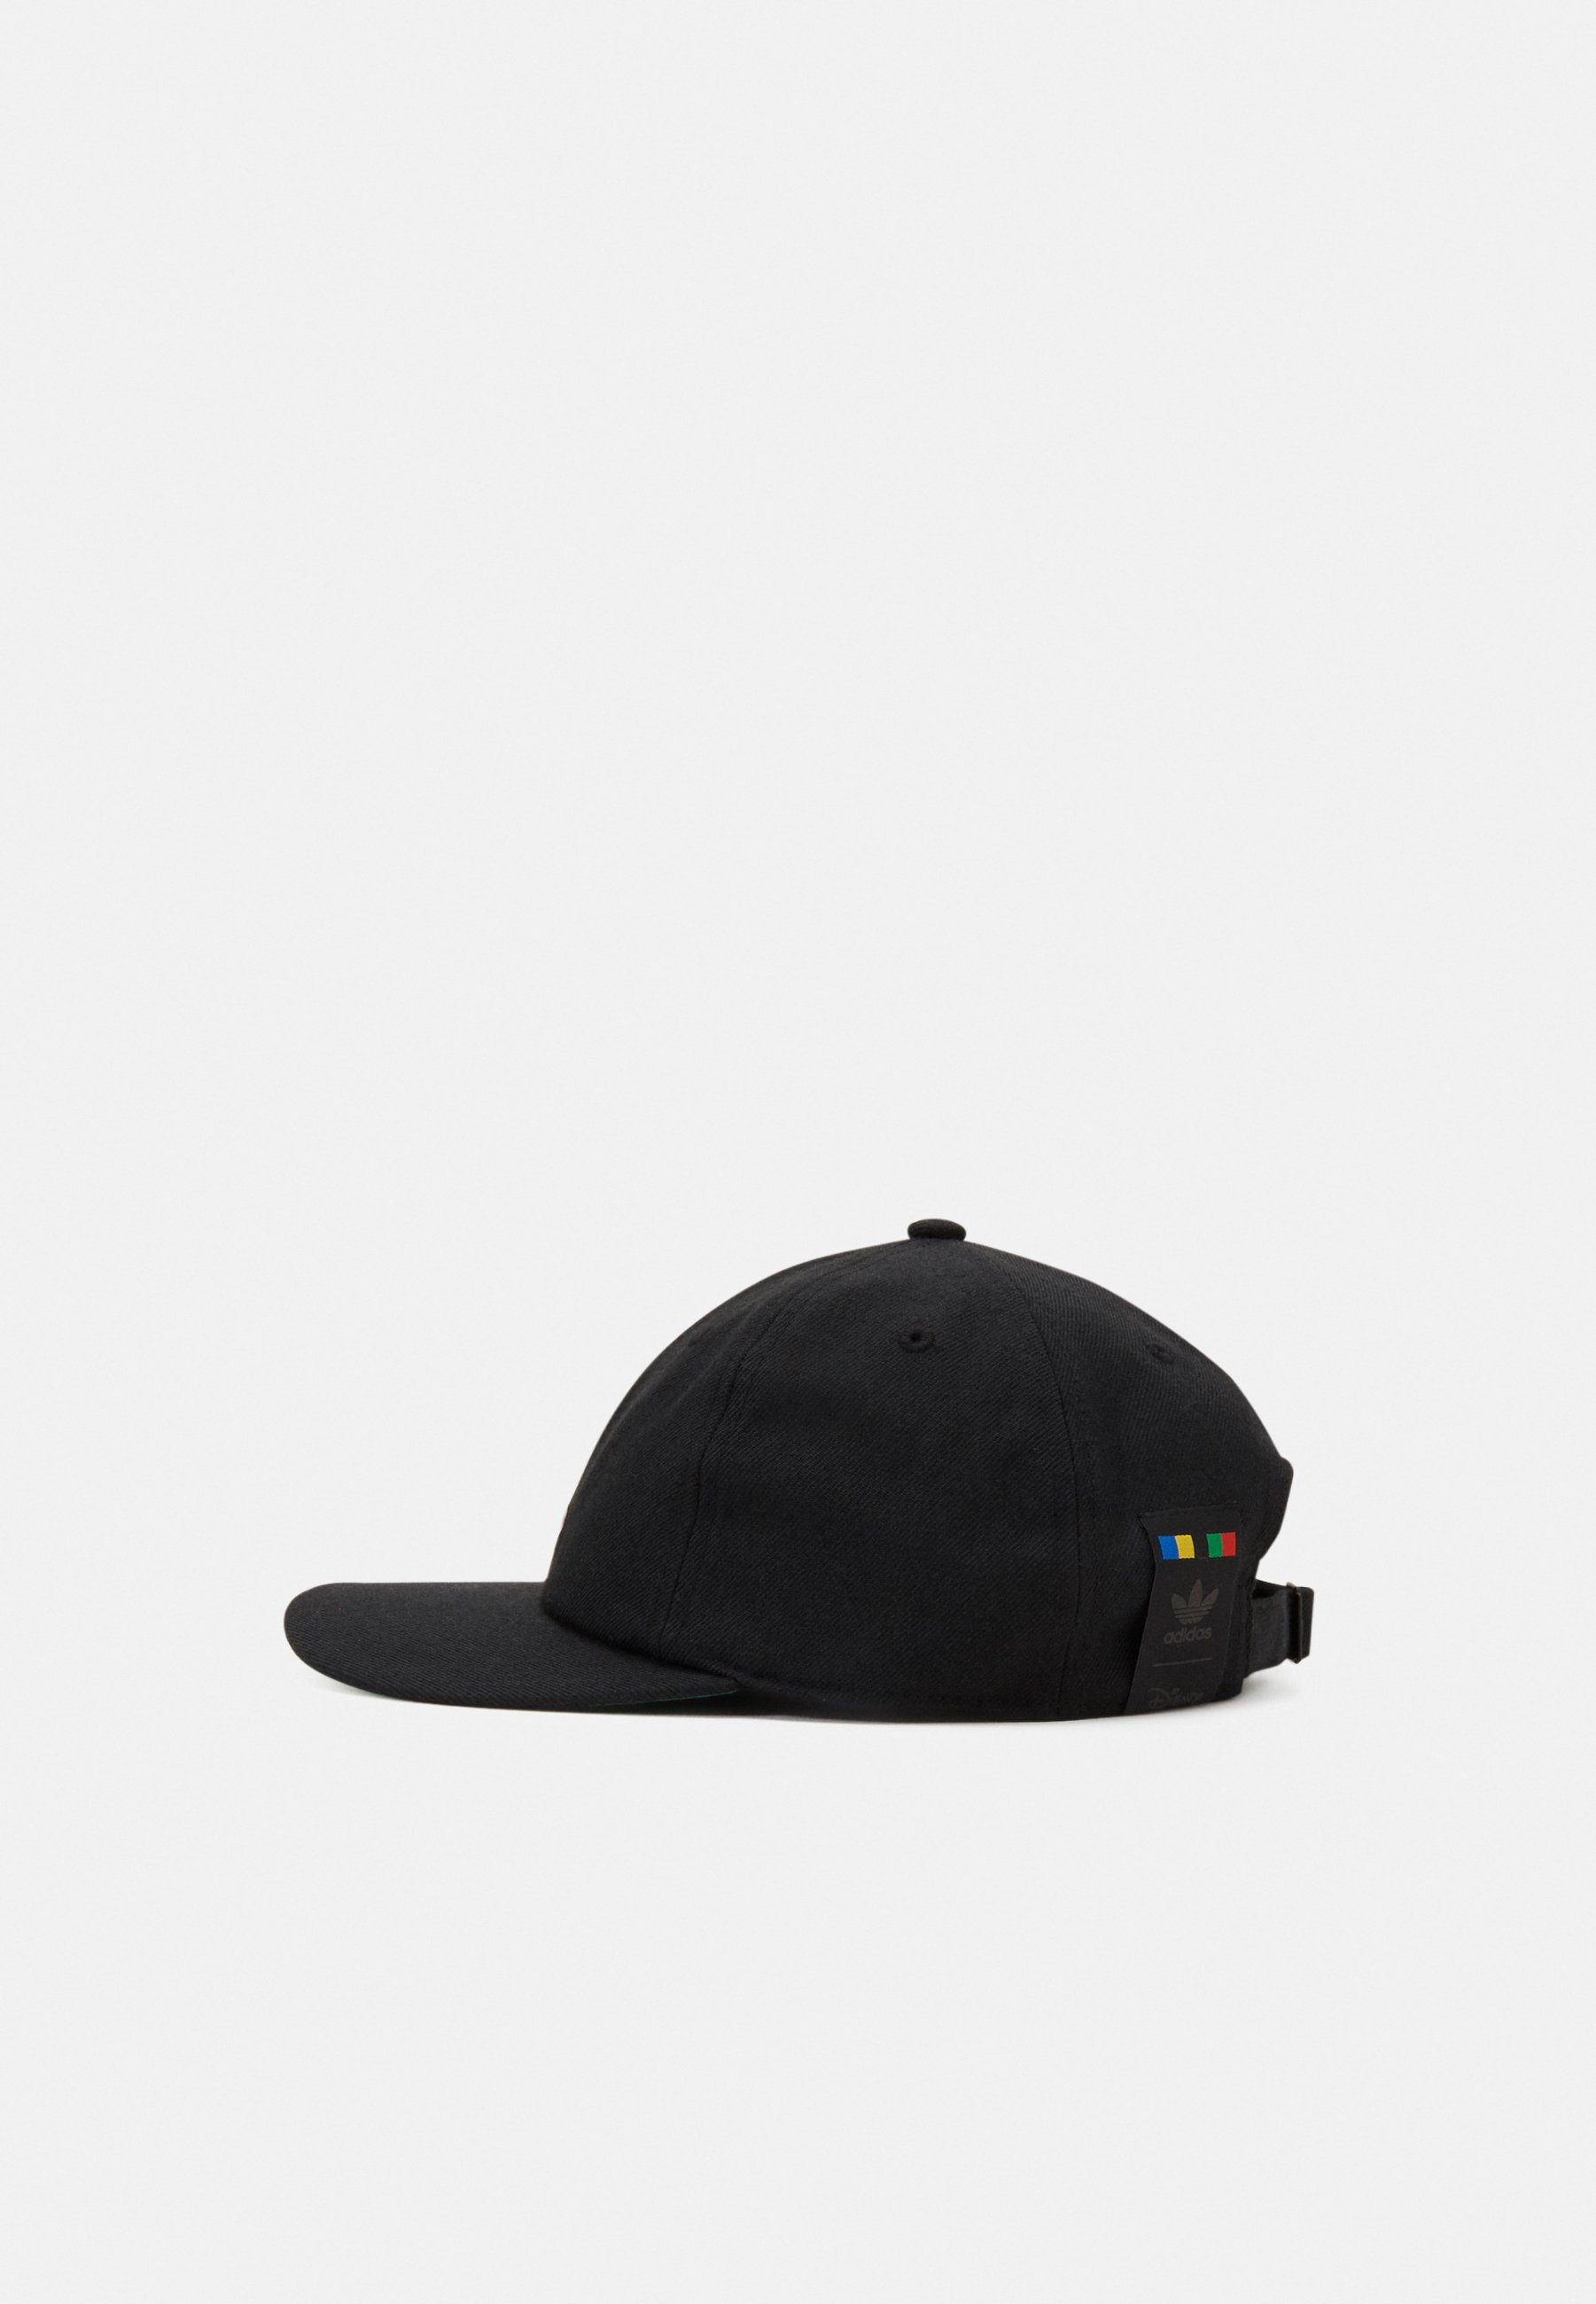 Adidas Originals Goofy - Cap Black/green/schwarz